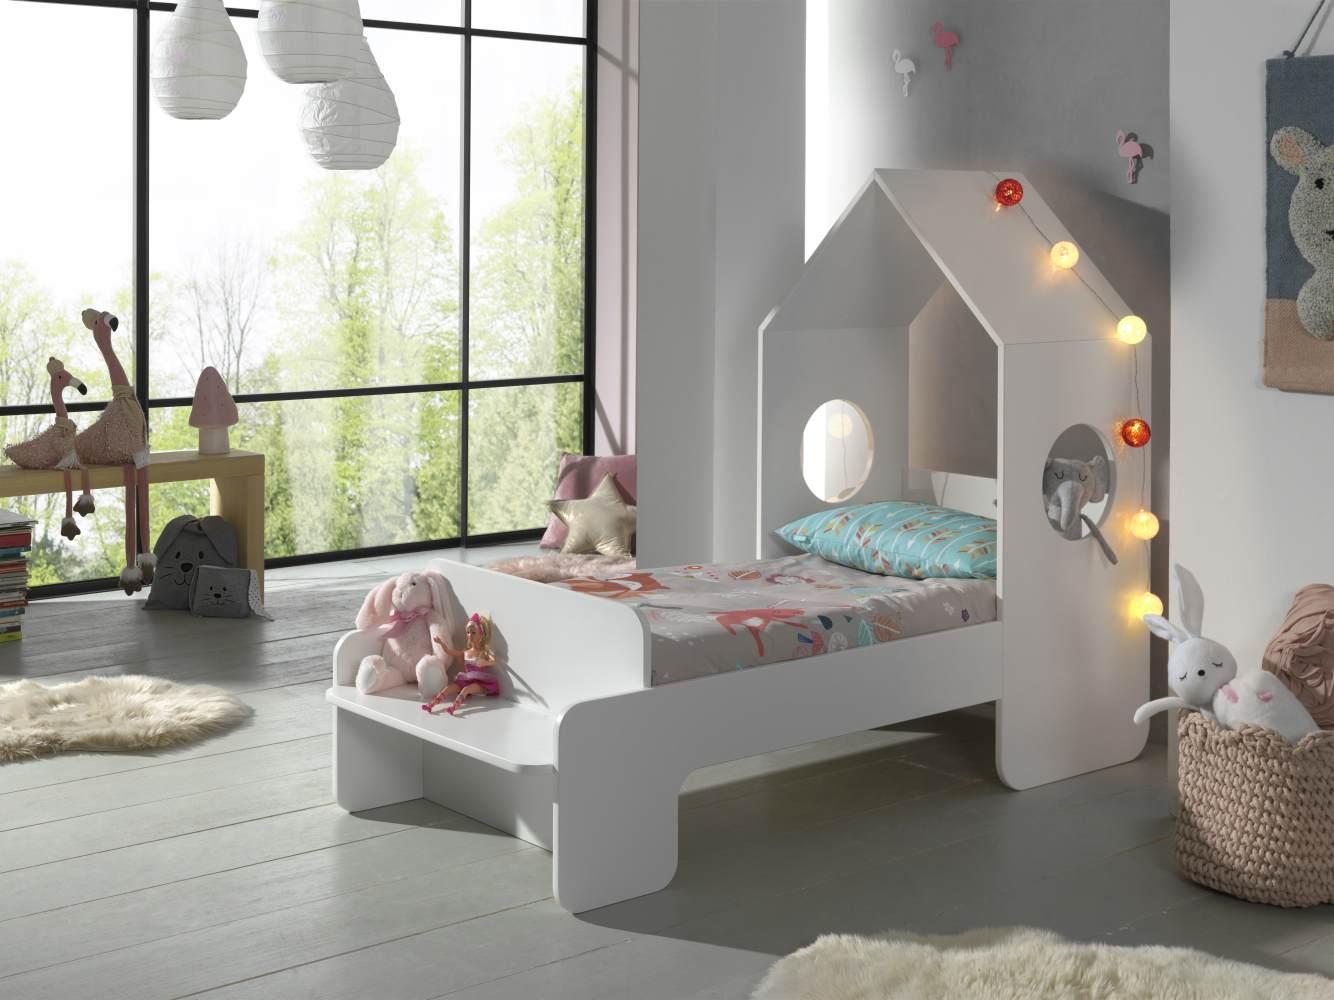 Vipack 'Casami' Hausbett 70 x 140 cm weiß lackiert Bild 1